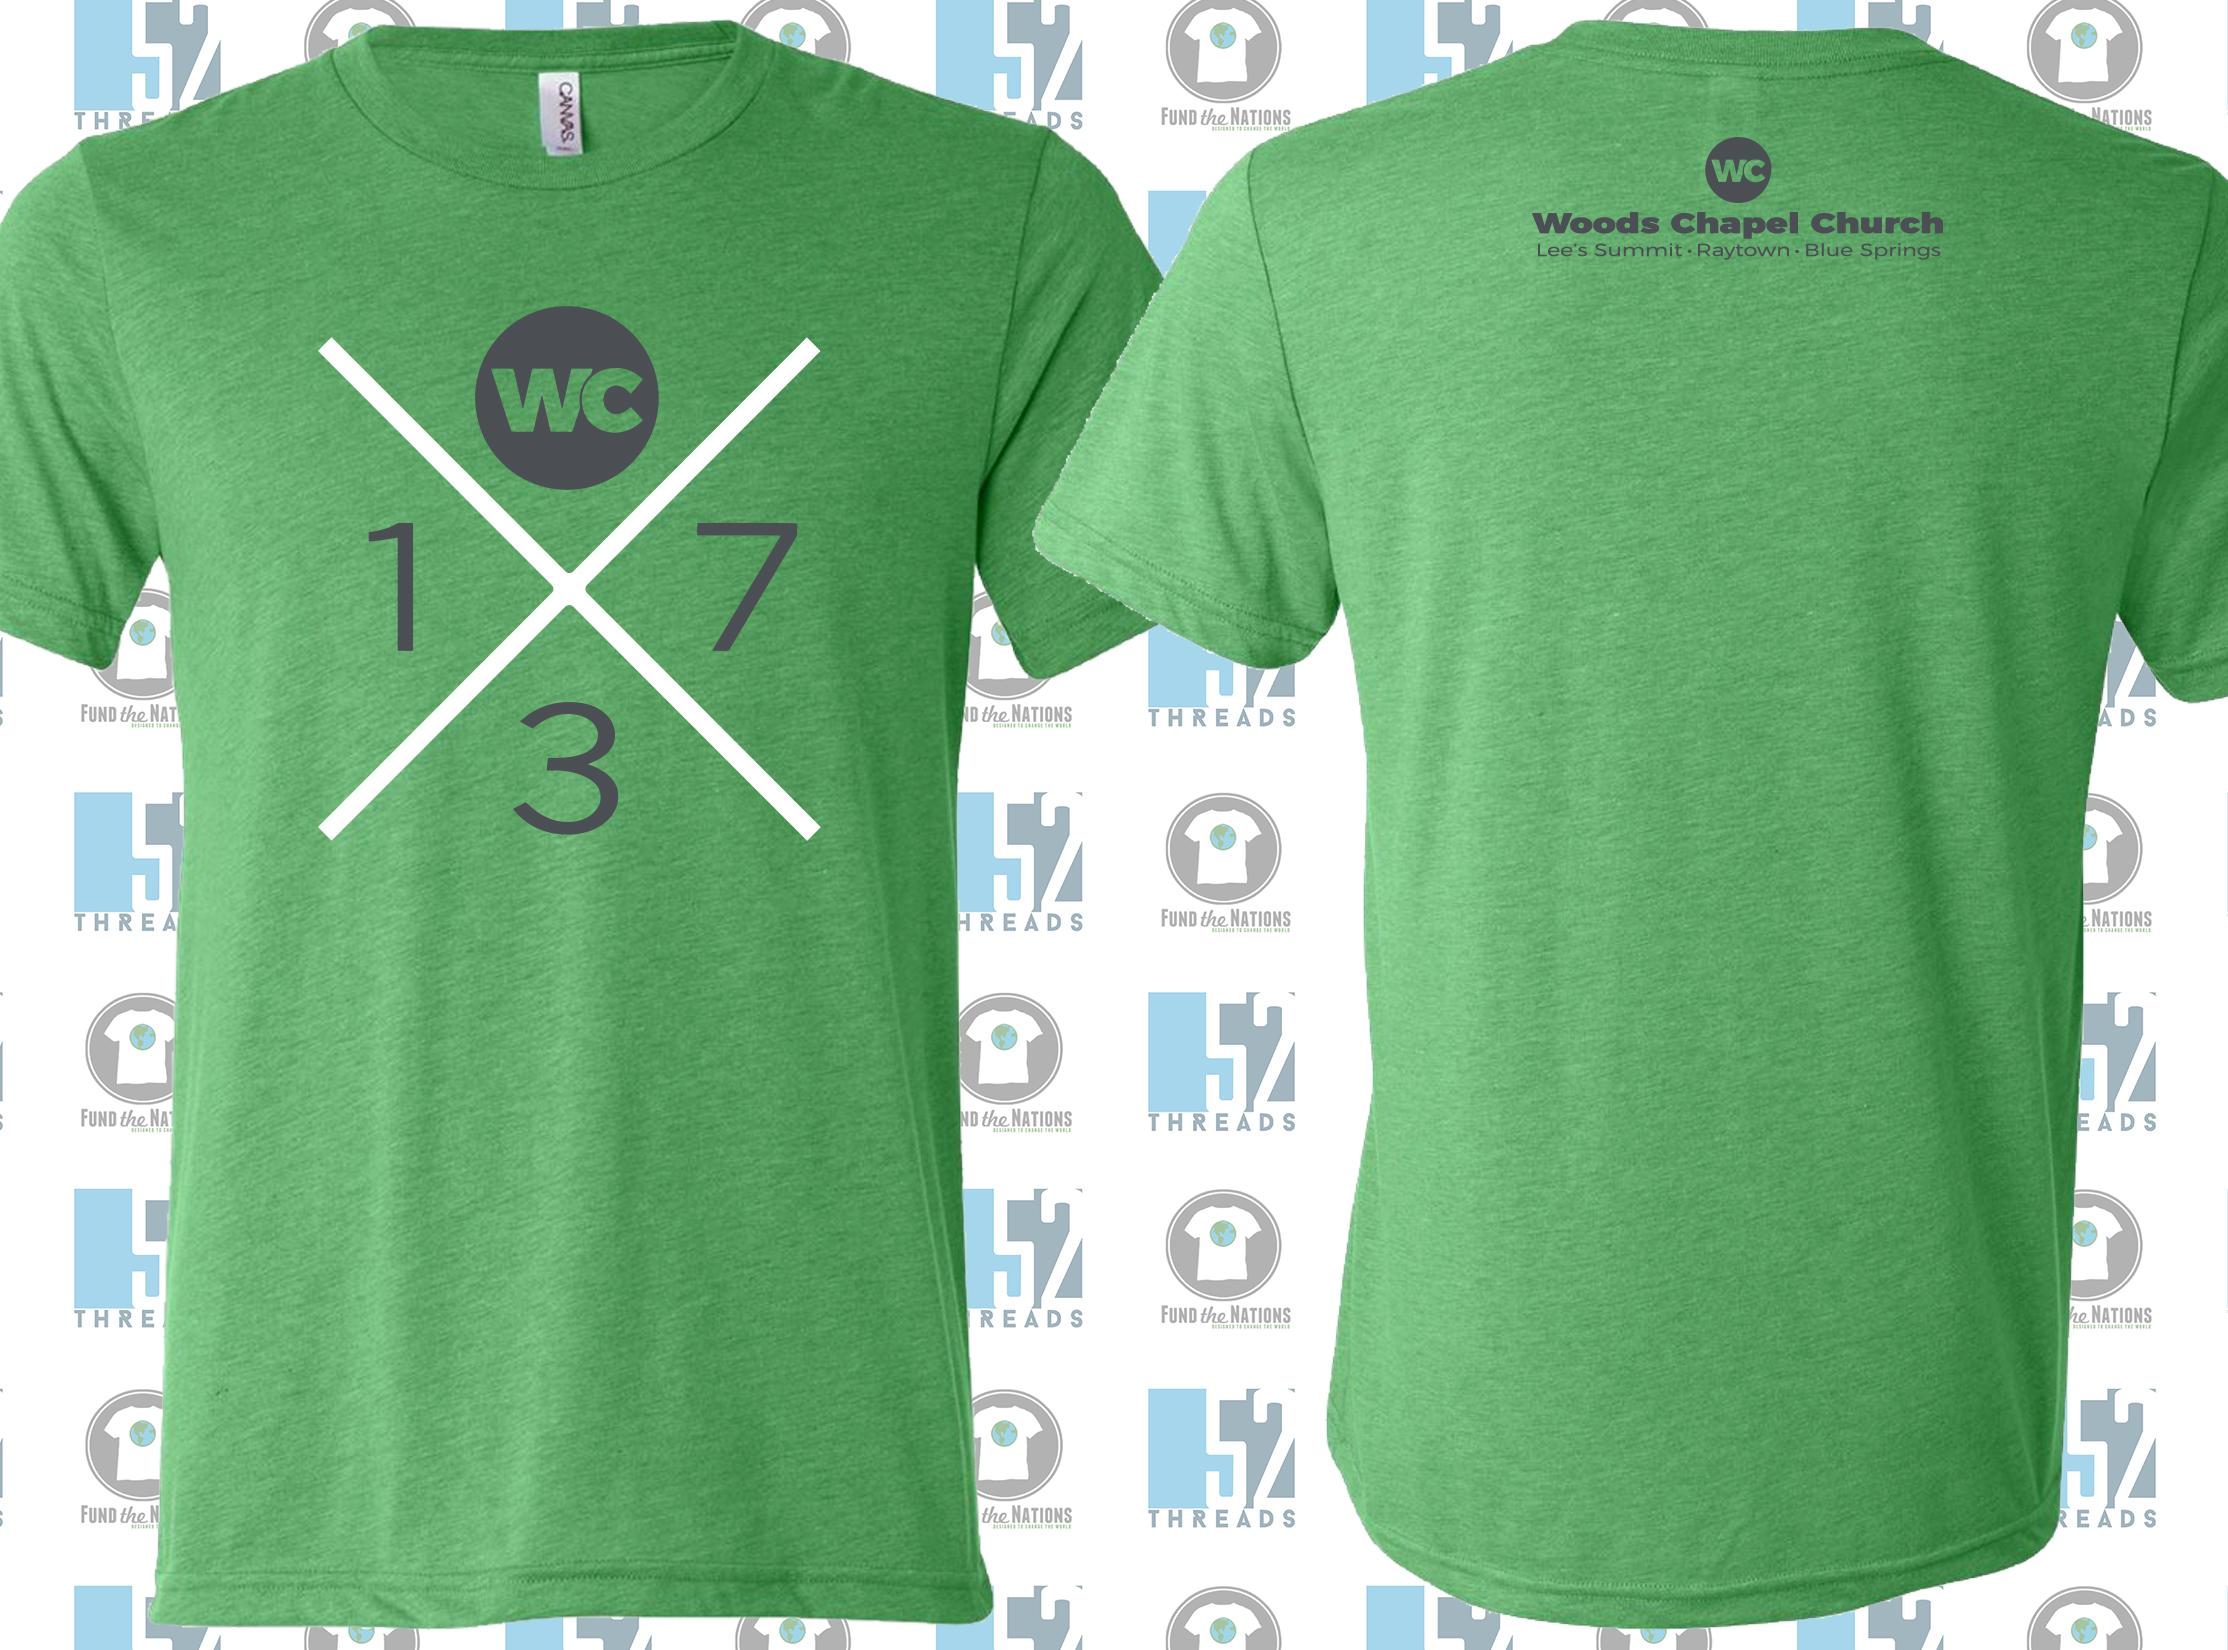 """1 Church, 3 Campuses, 7 Worshiping Communities"" Shirt"